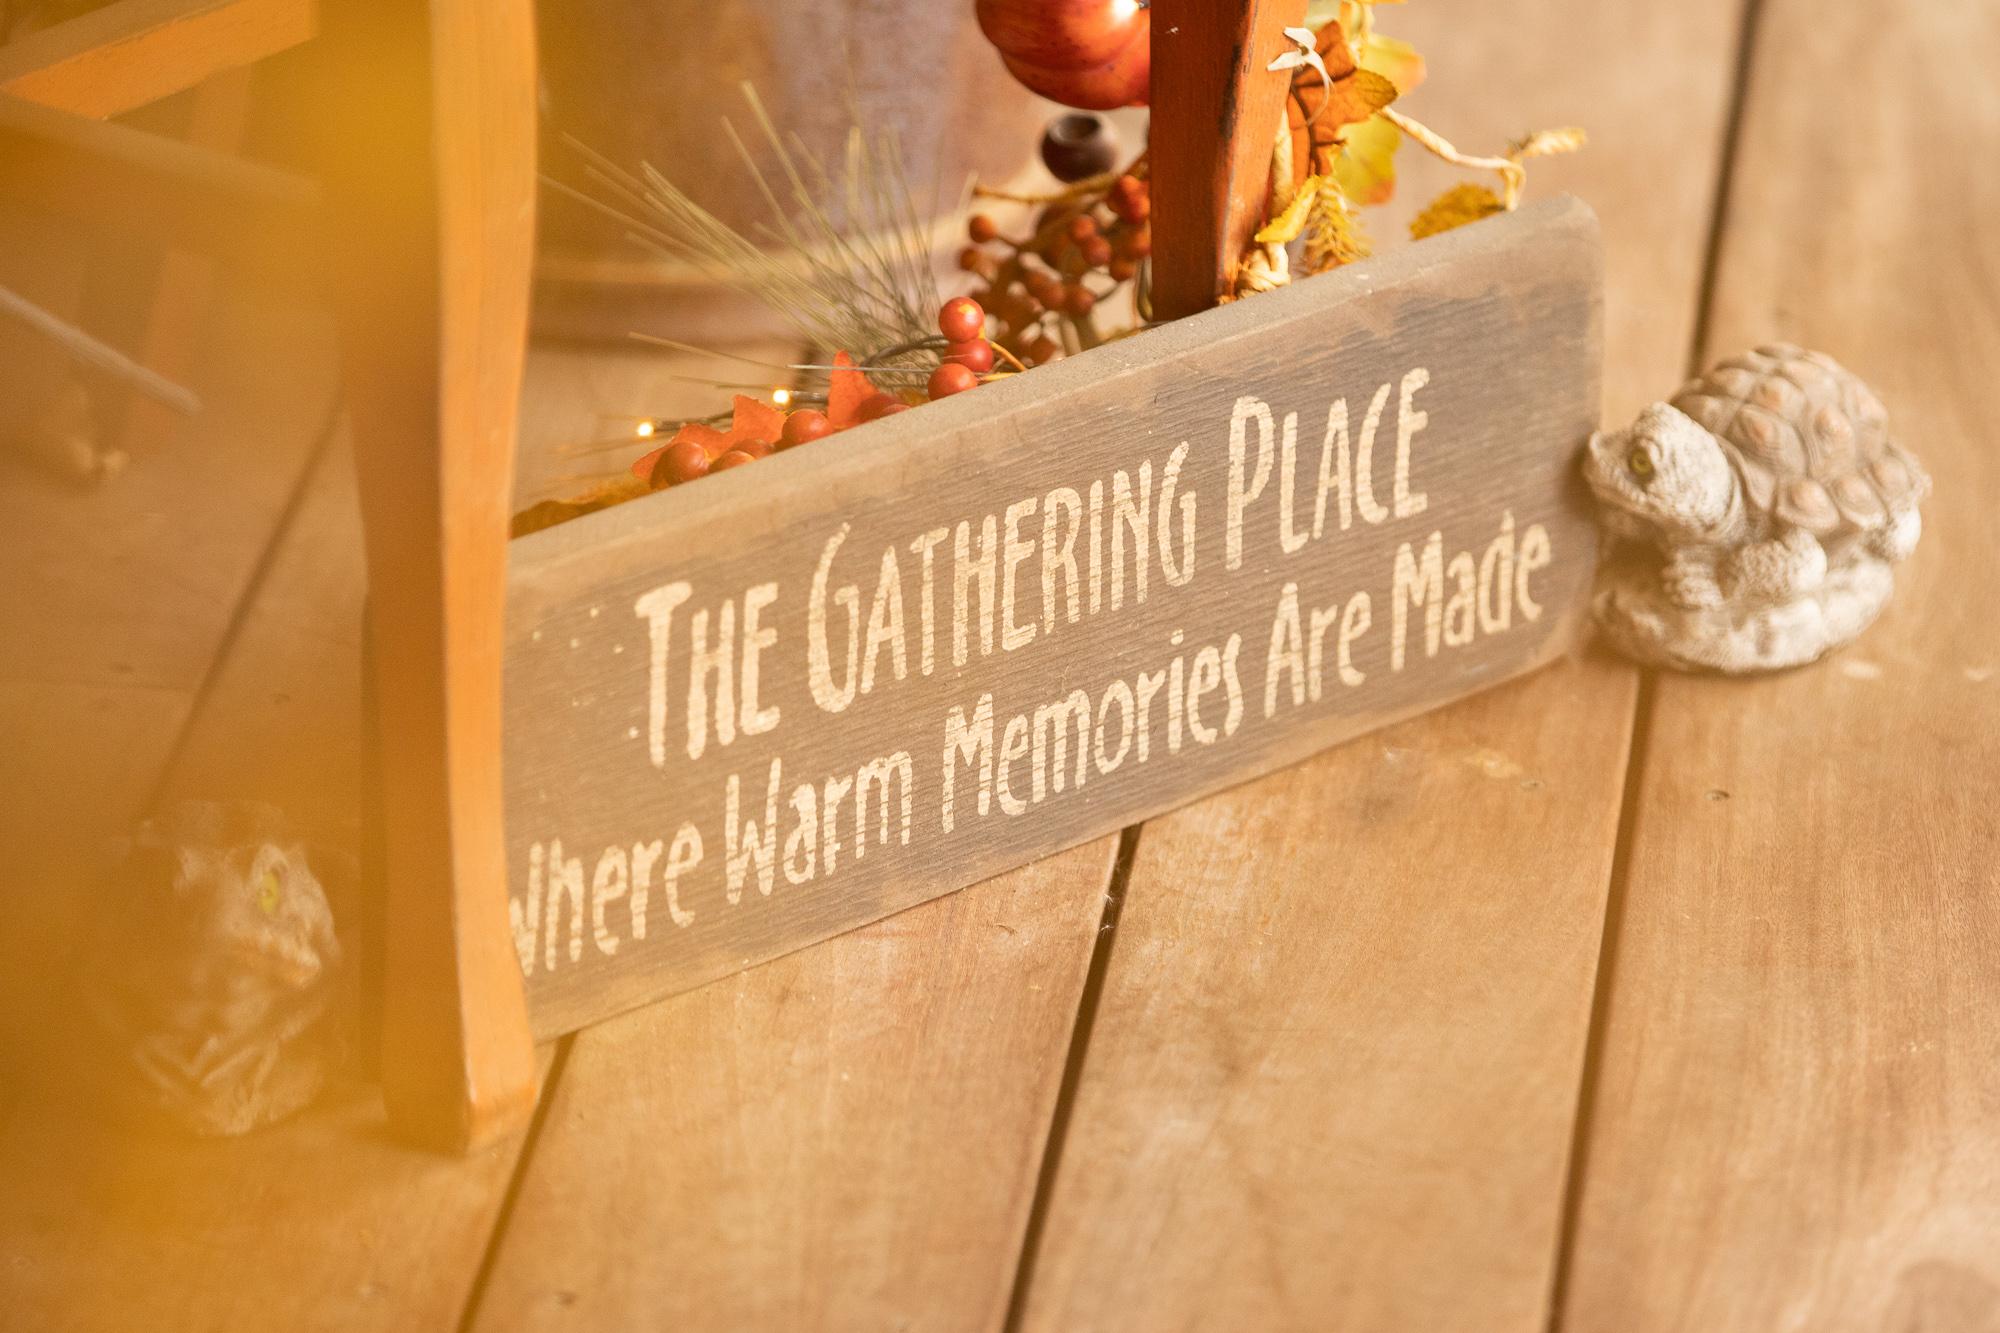 The Gathering Place at Darlington Lake wedding.